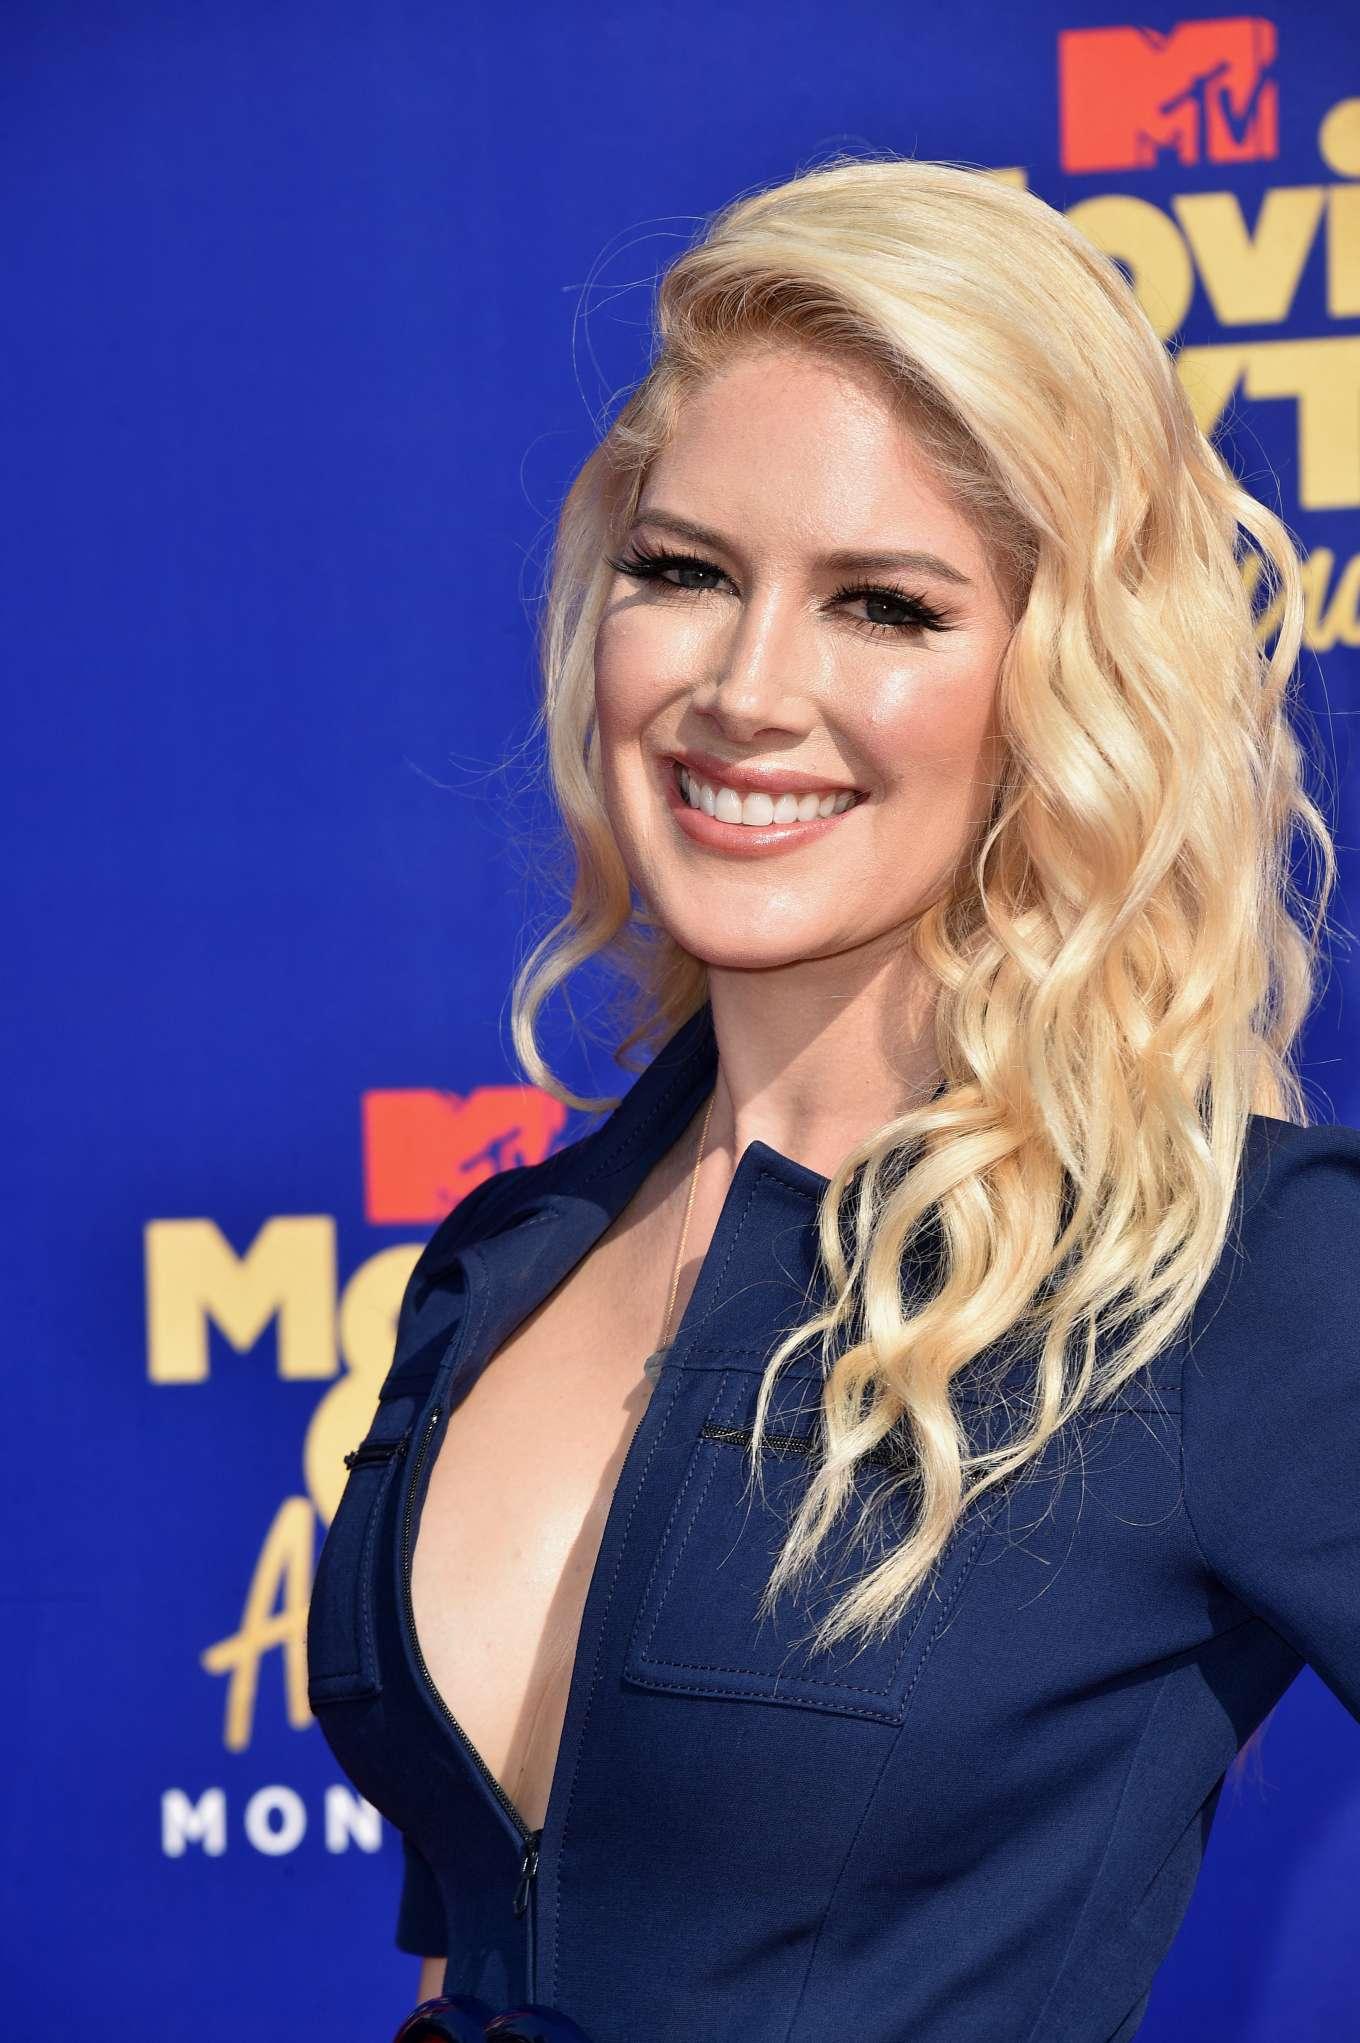 Heidi Montag 2019 : Heidi Montag: 2019 MTV Movie and TV Awards Red Carpet-07